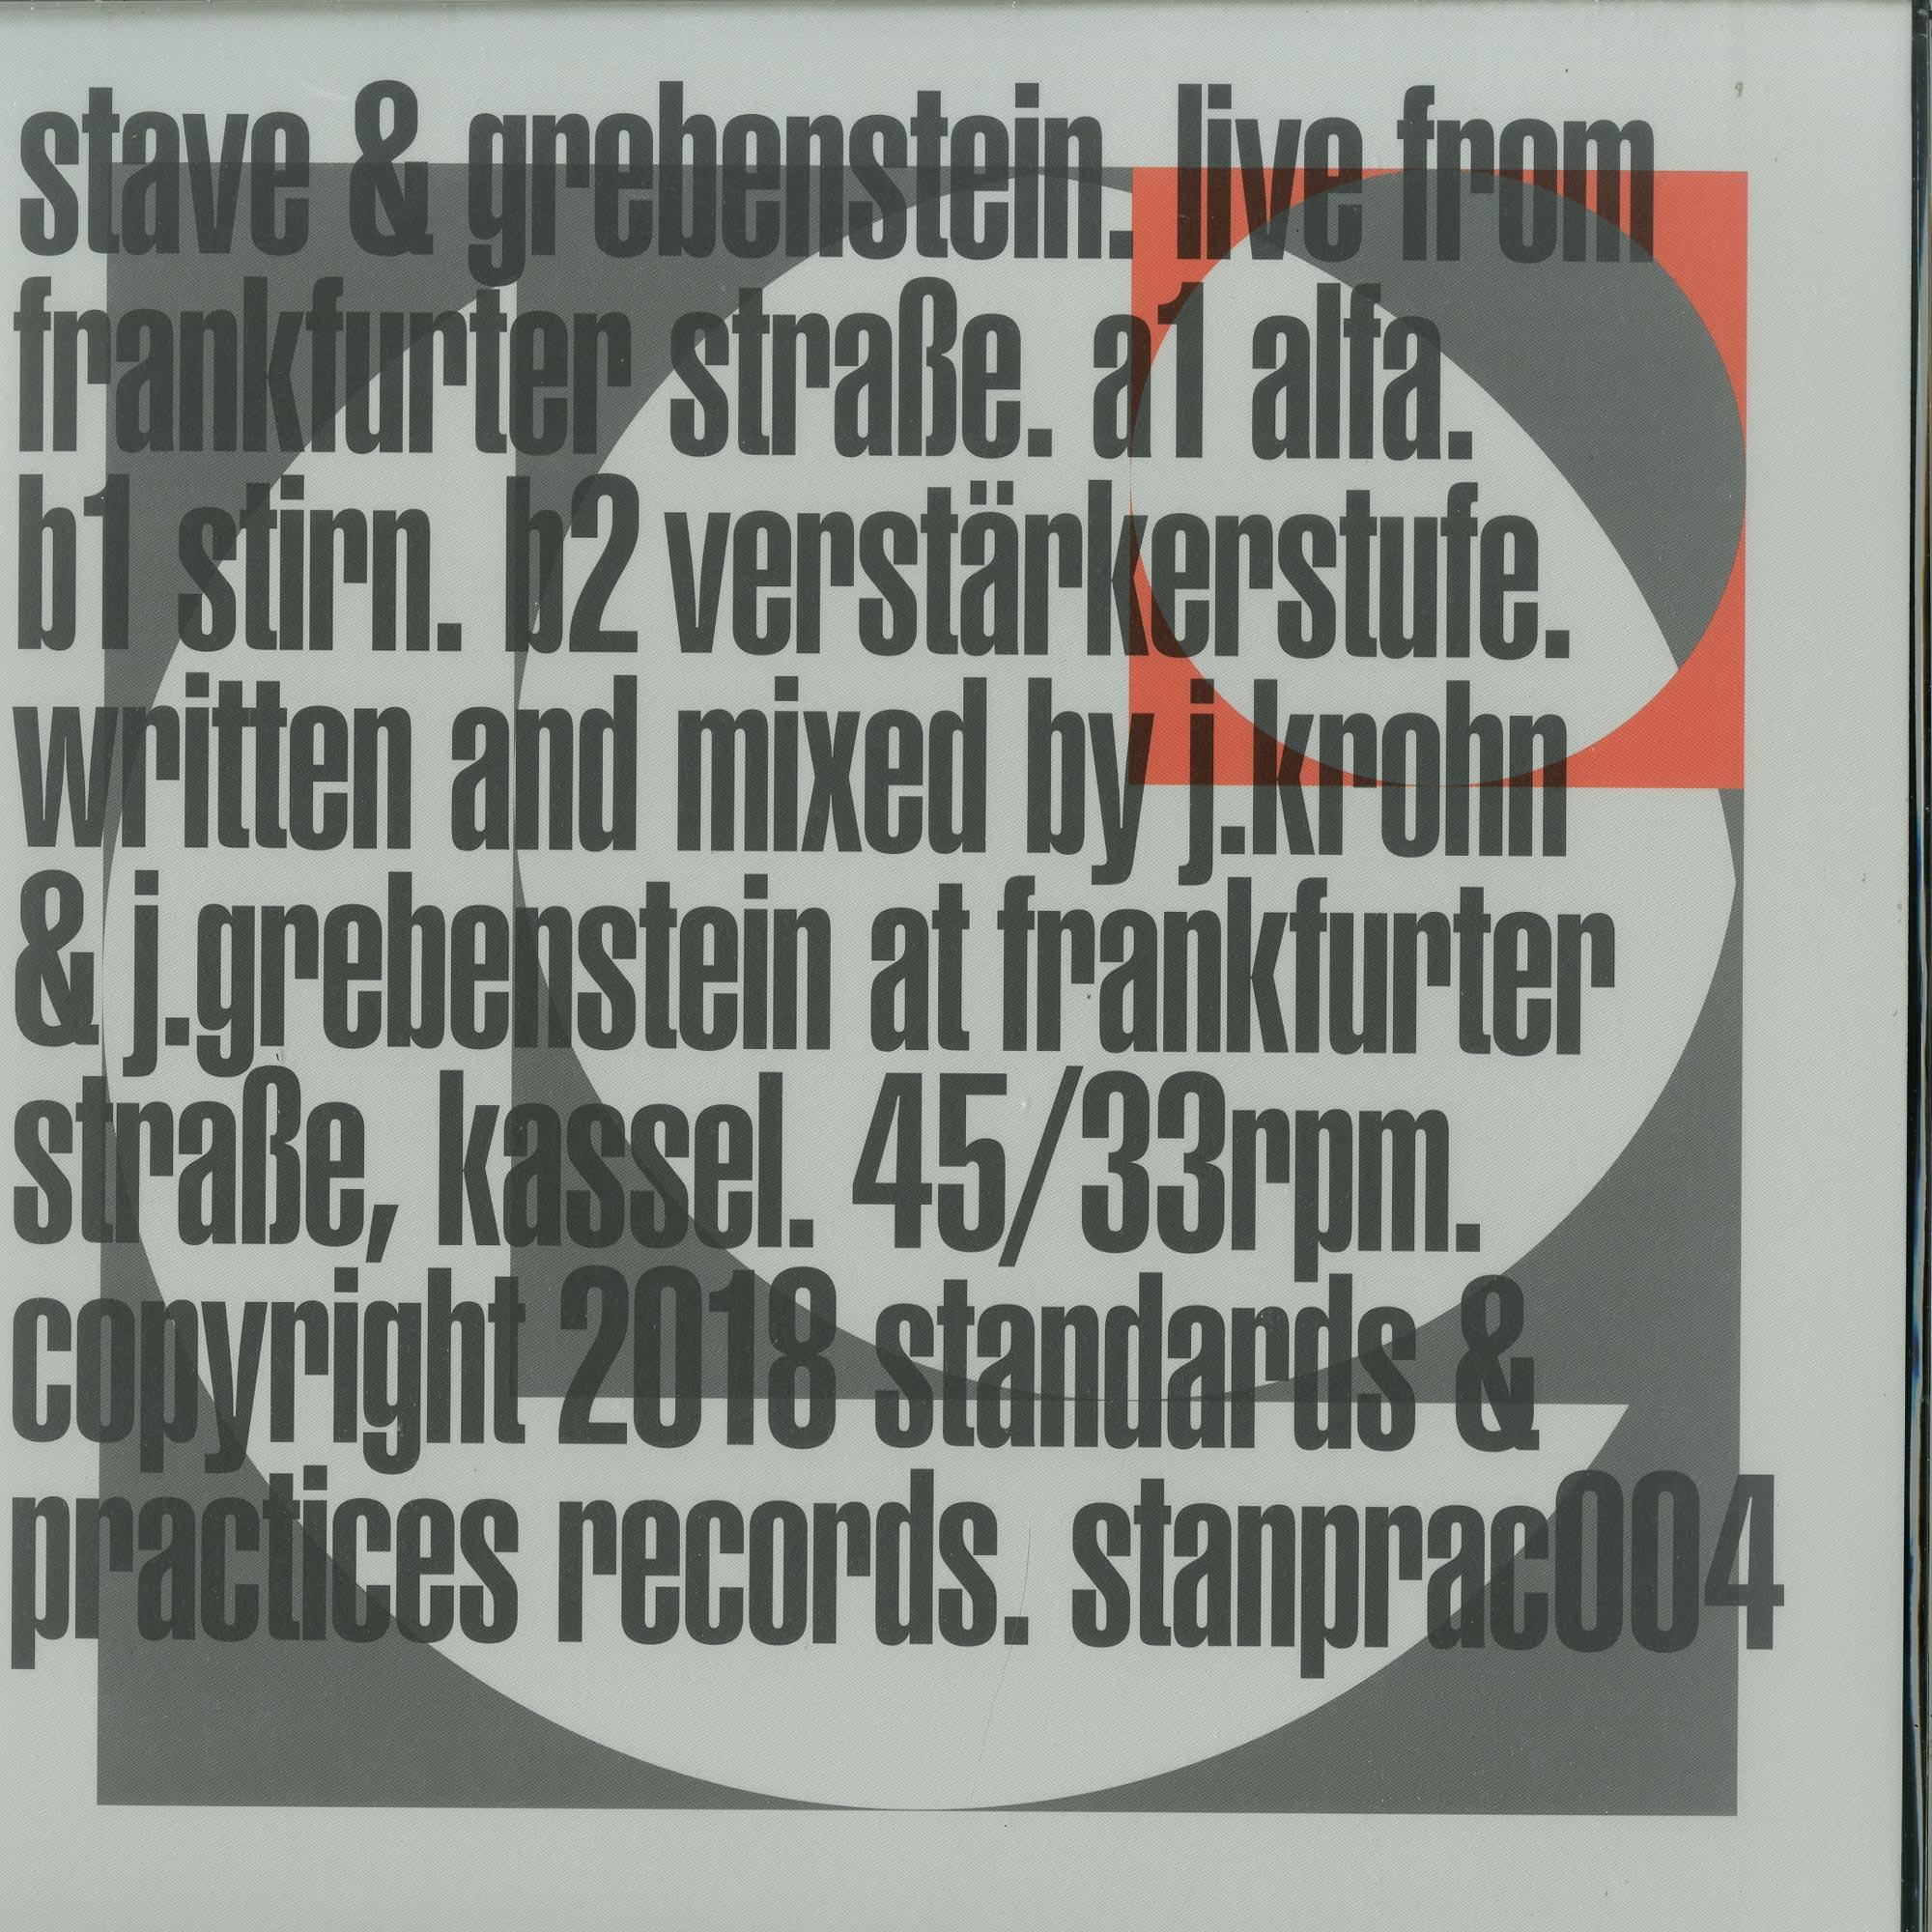 Stave & Grebenstein - LIVE FROM FRANKFURTER STRASSE